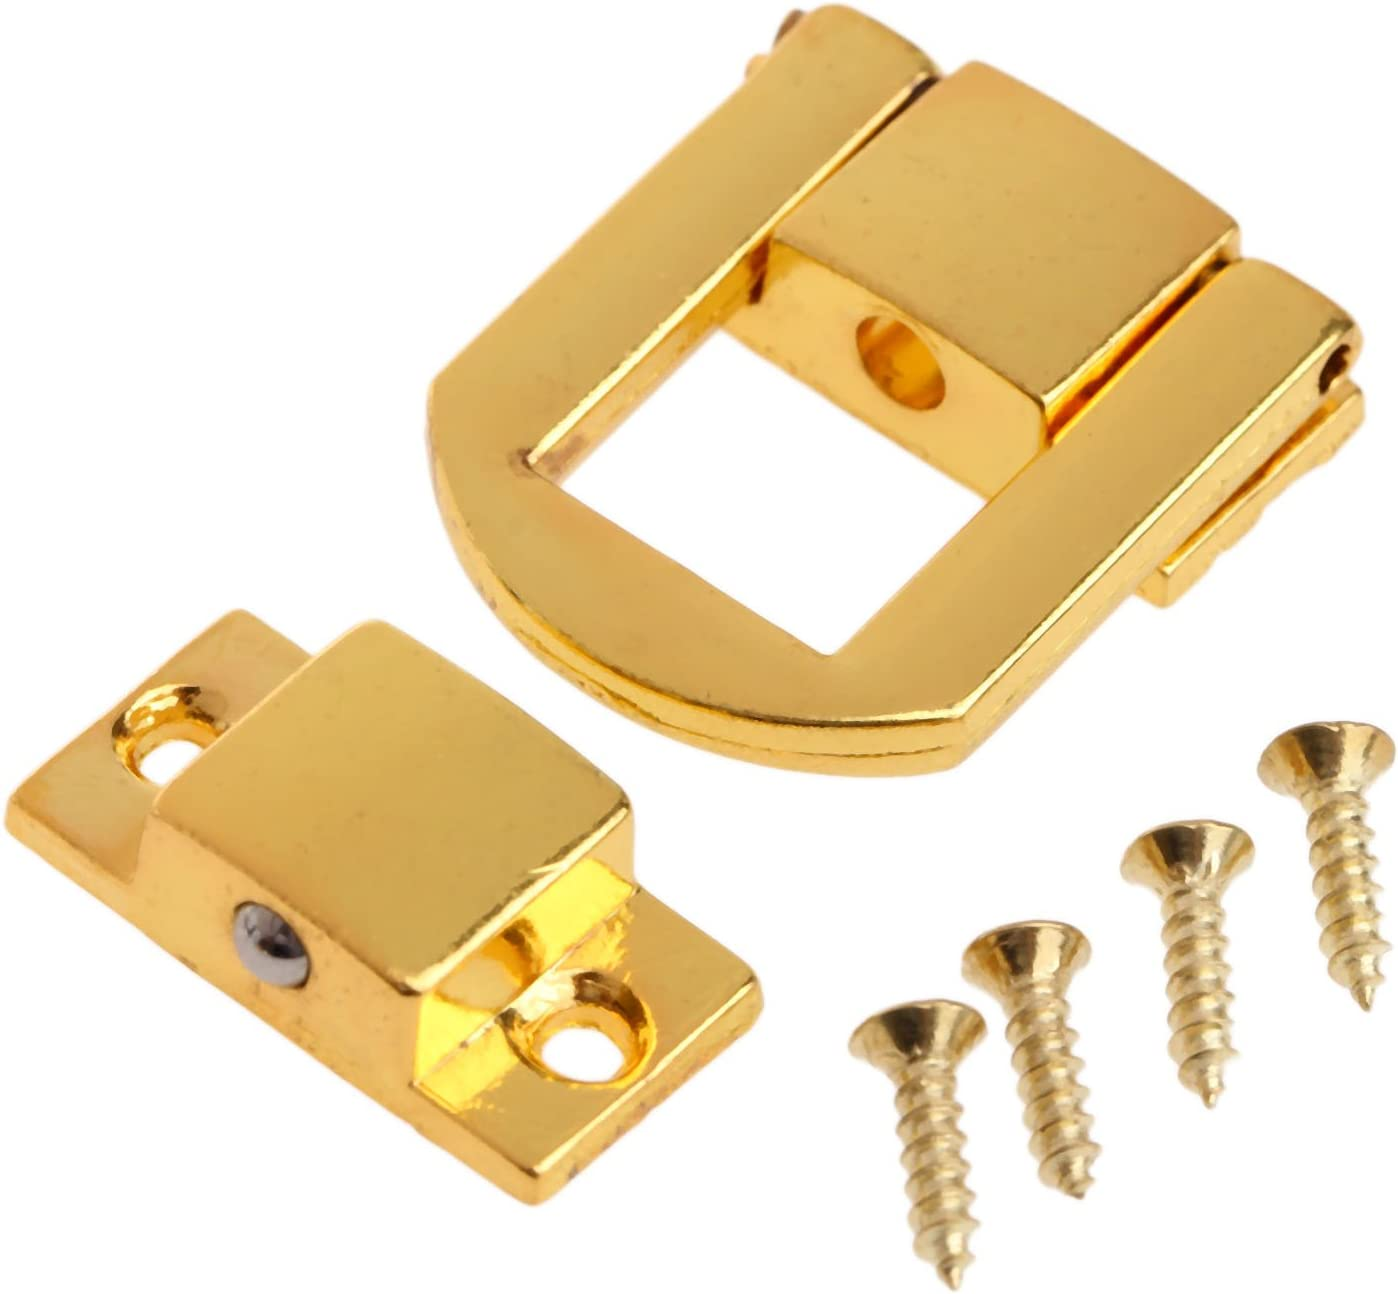 48mm Bronze Decorative Hasp Jewelry Wooden Box Catch w Screws Toggle Latch